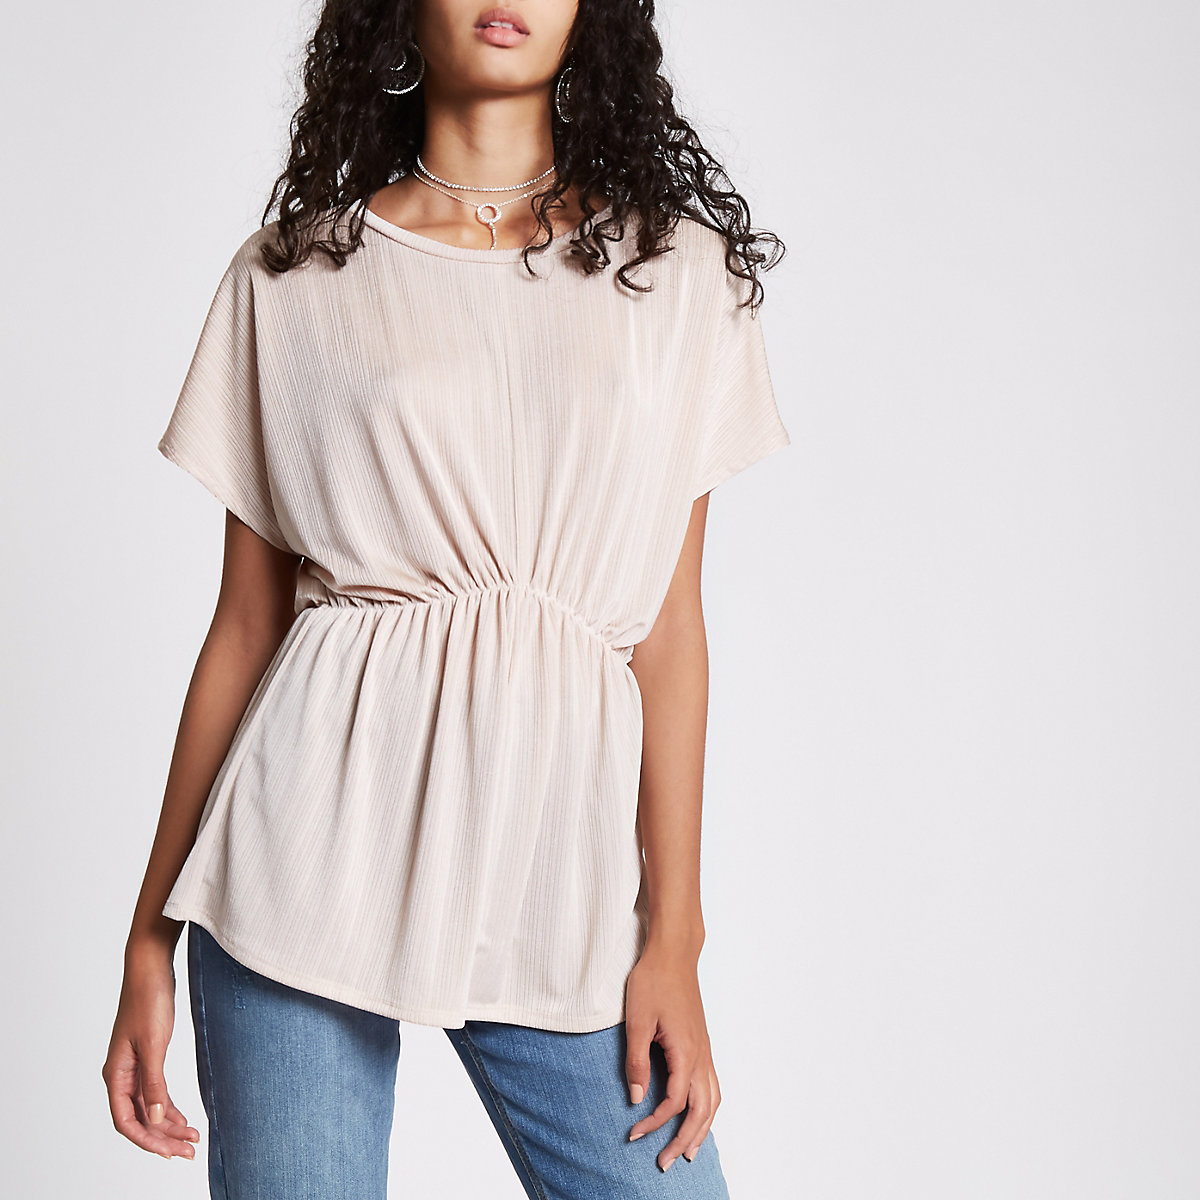 Pink short sleeve batwing top